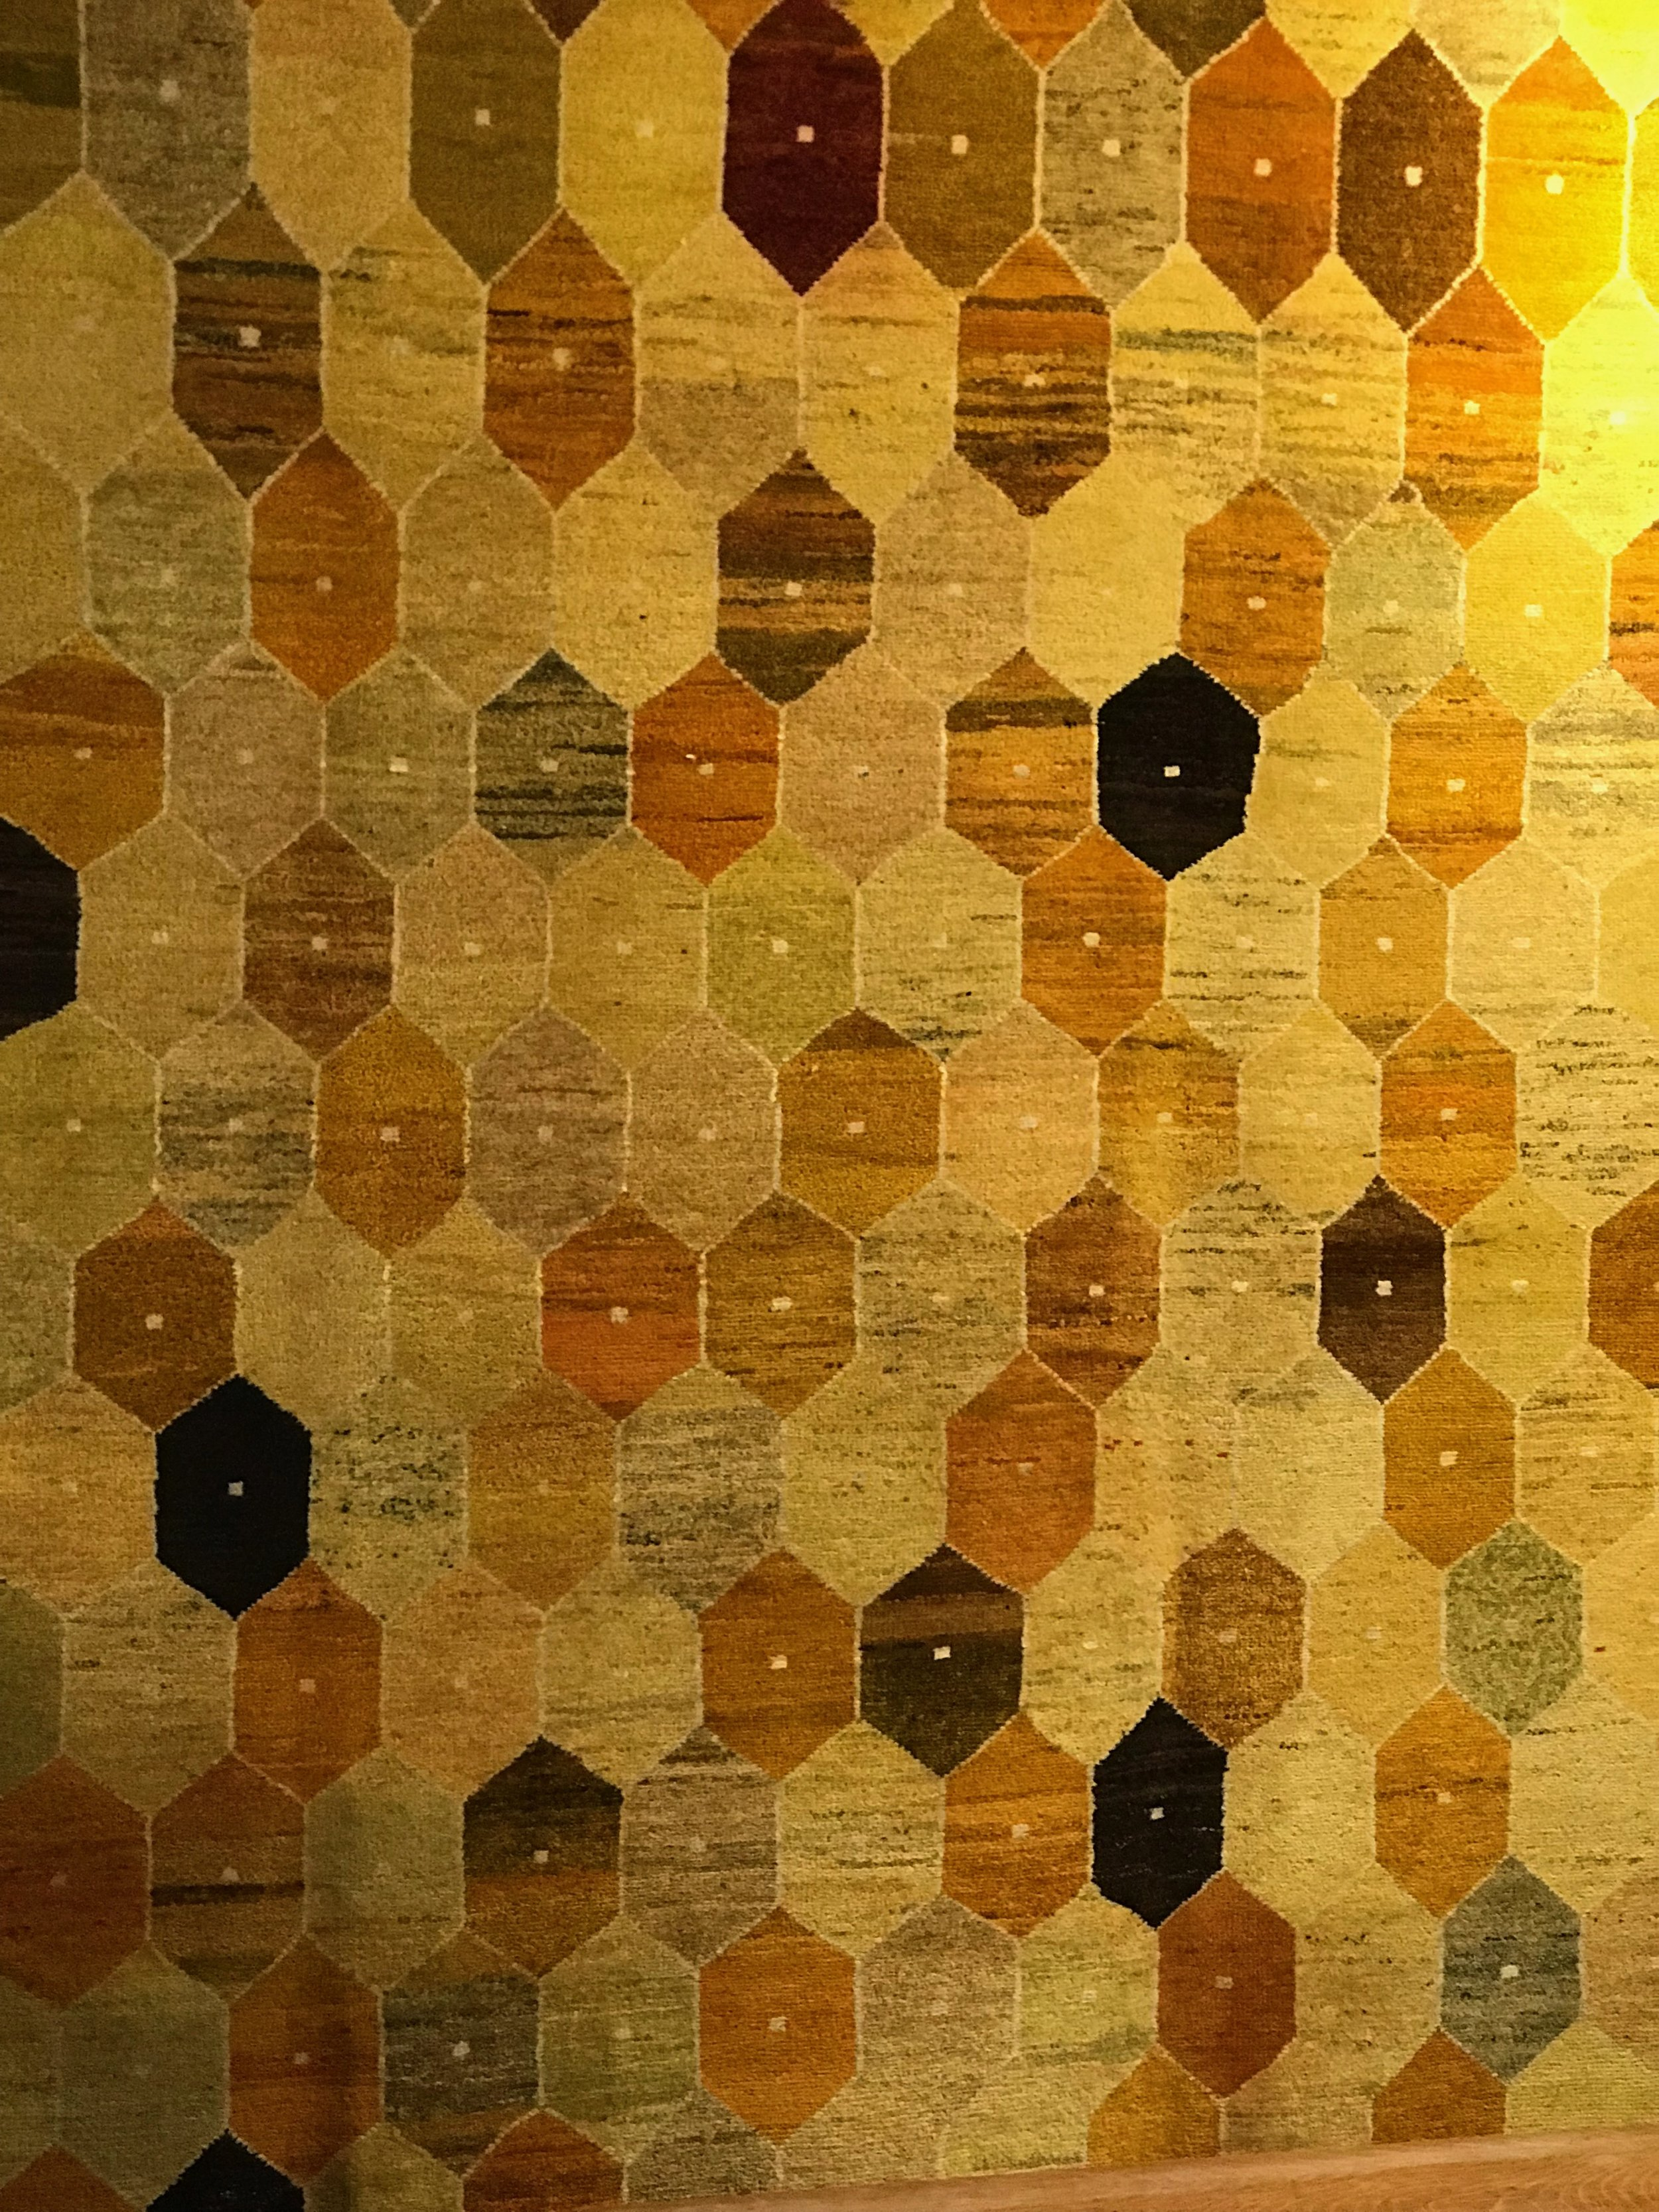 web honeycomb 10by13.jpg